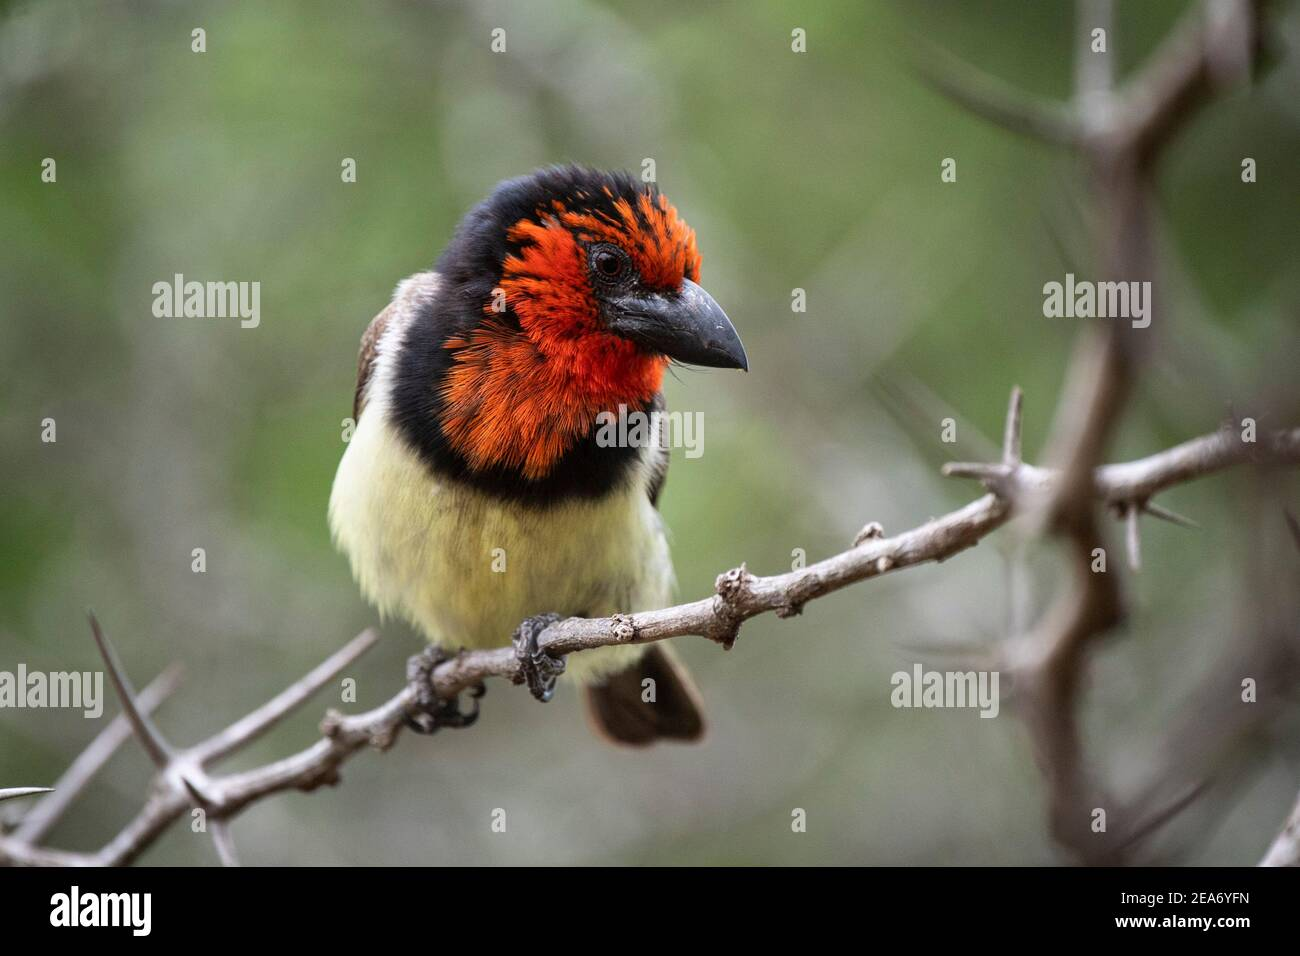 Schwarzhalsbarbet, Lybius torquatus, Krüger National Park, Südafrika Stockfoto